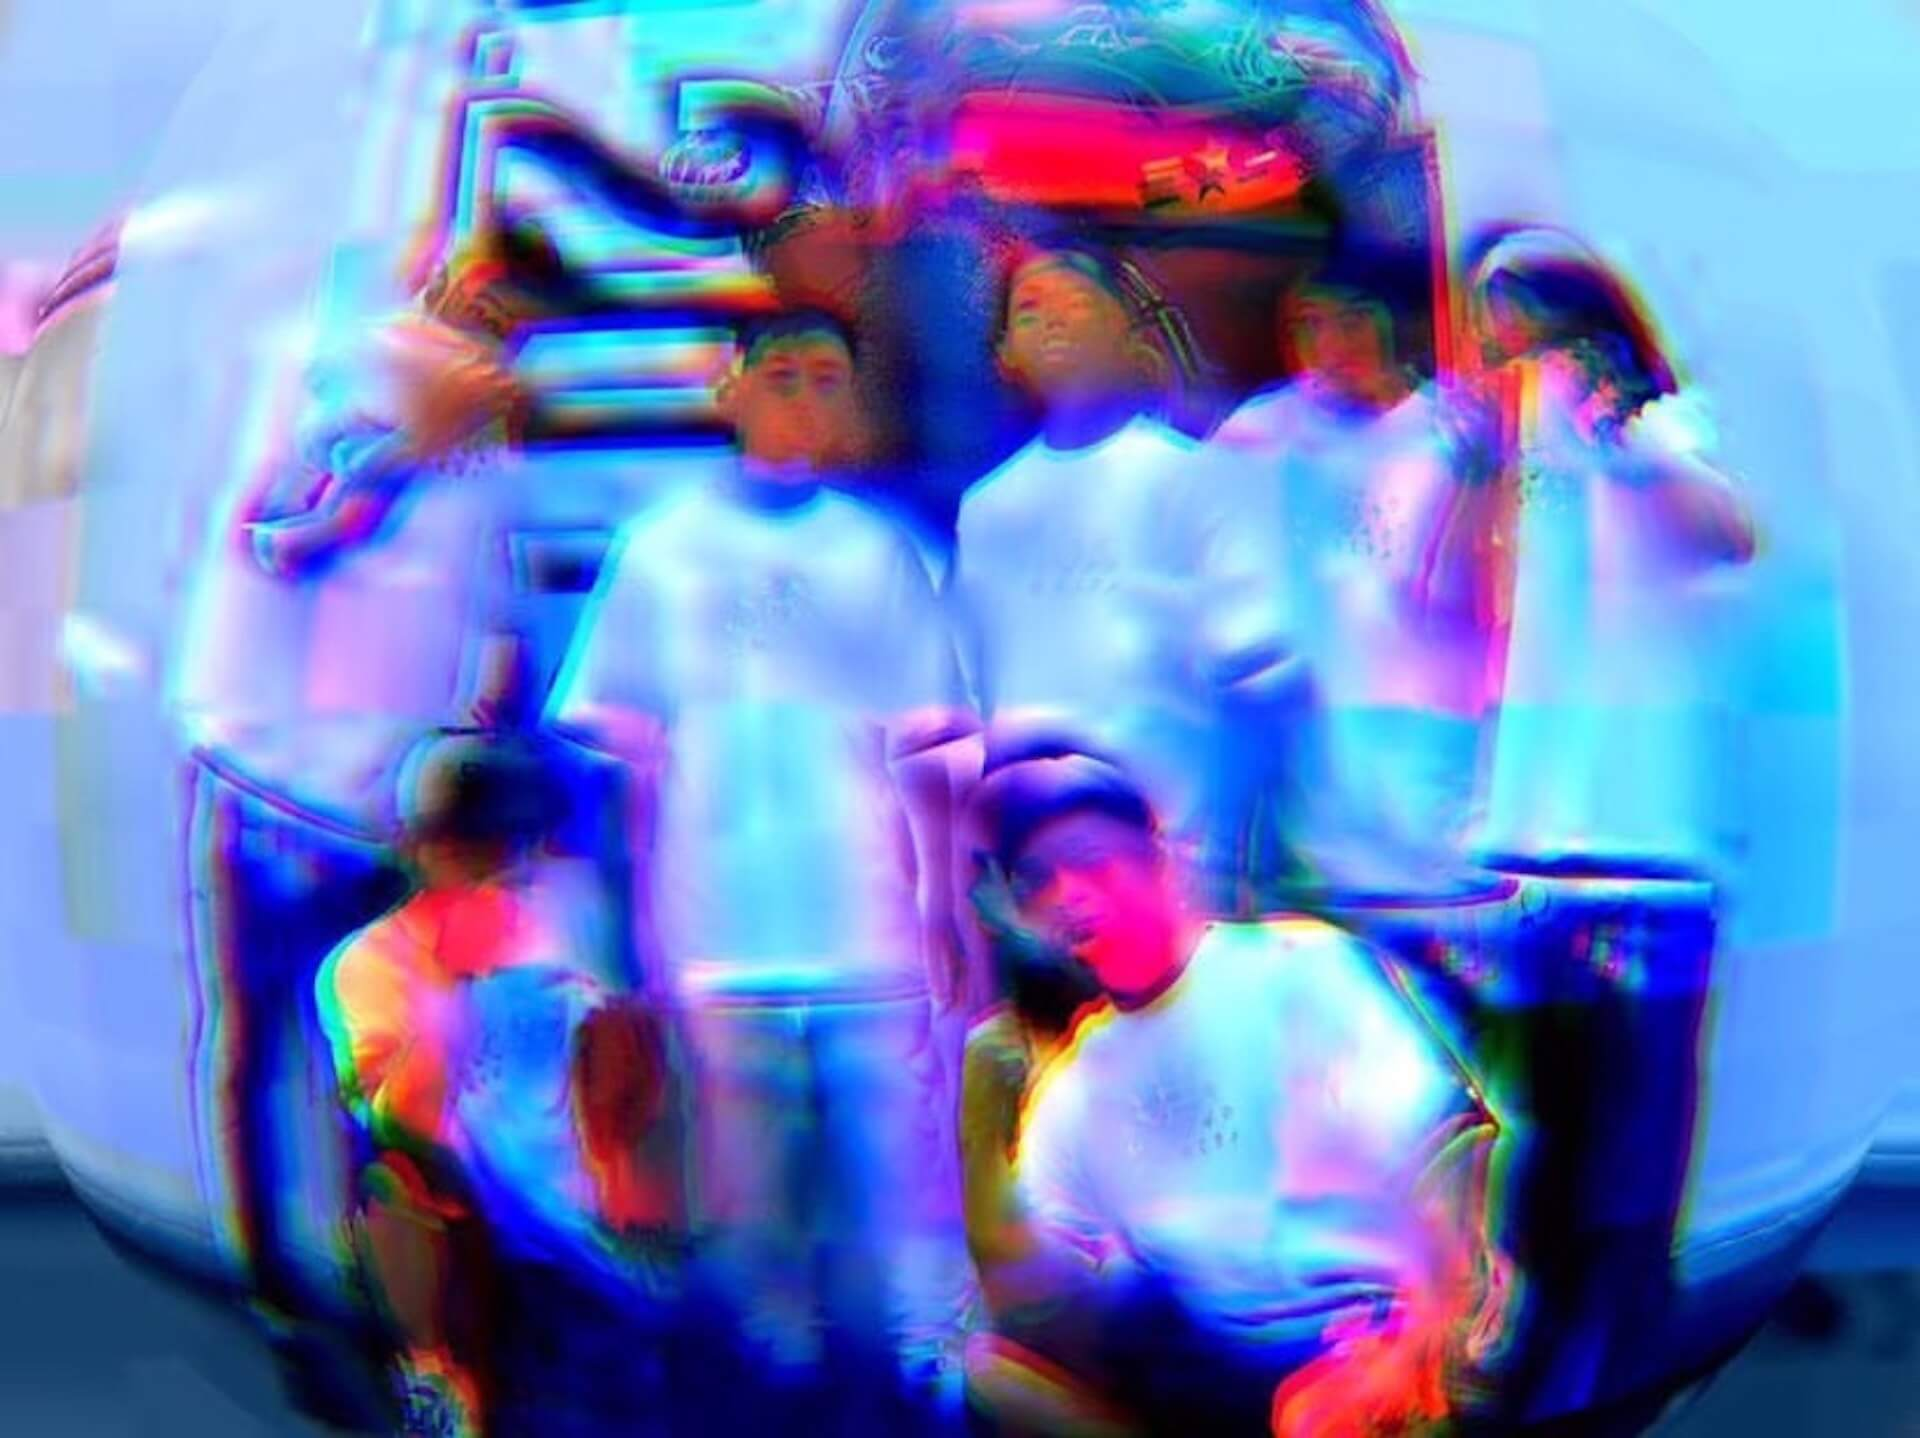 Galaxy 銀河系にてエキセントリックなパーティー<ぎゃ vol.4>が開催|テクノウルフ、VMO、ralph、baduerykah、Utaeが登場 music191115-gya-2